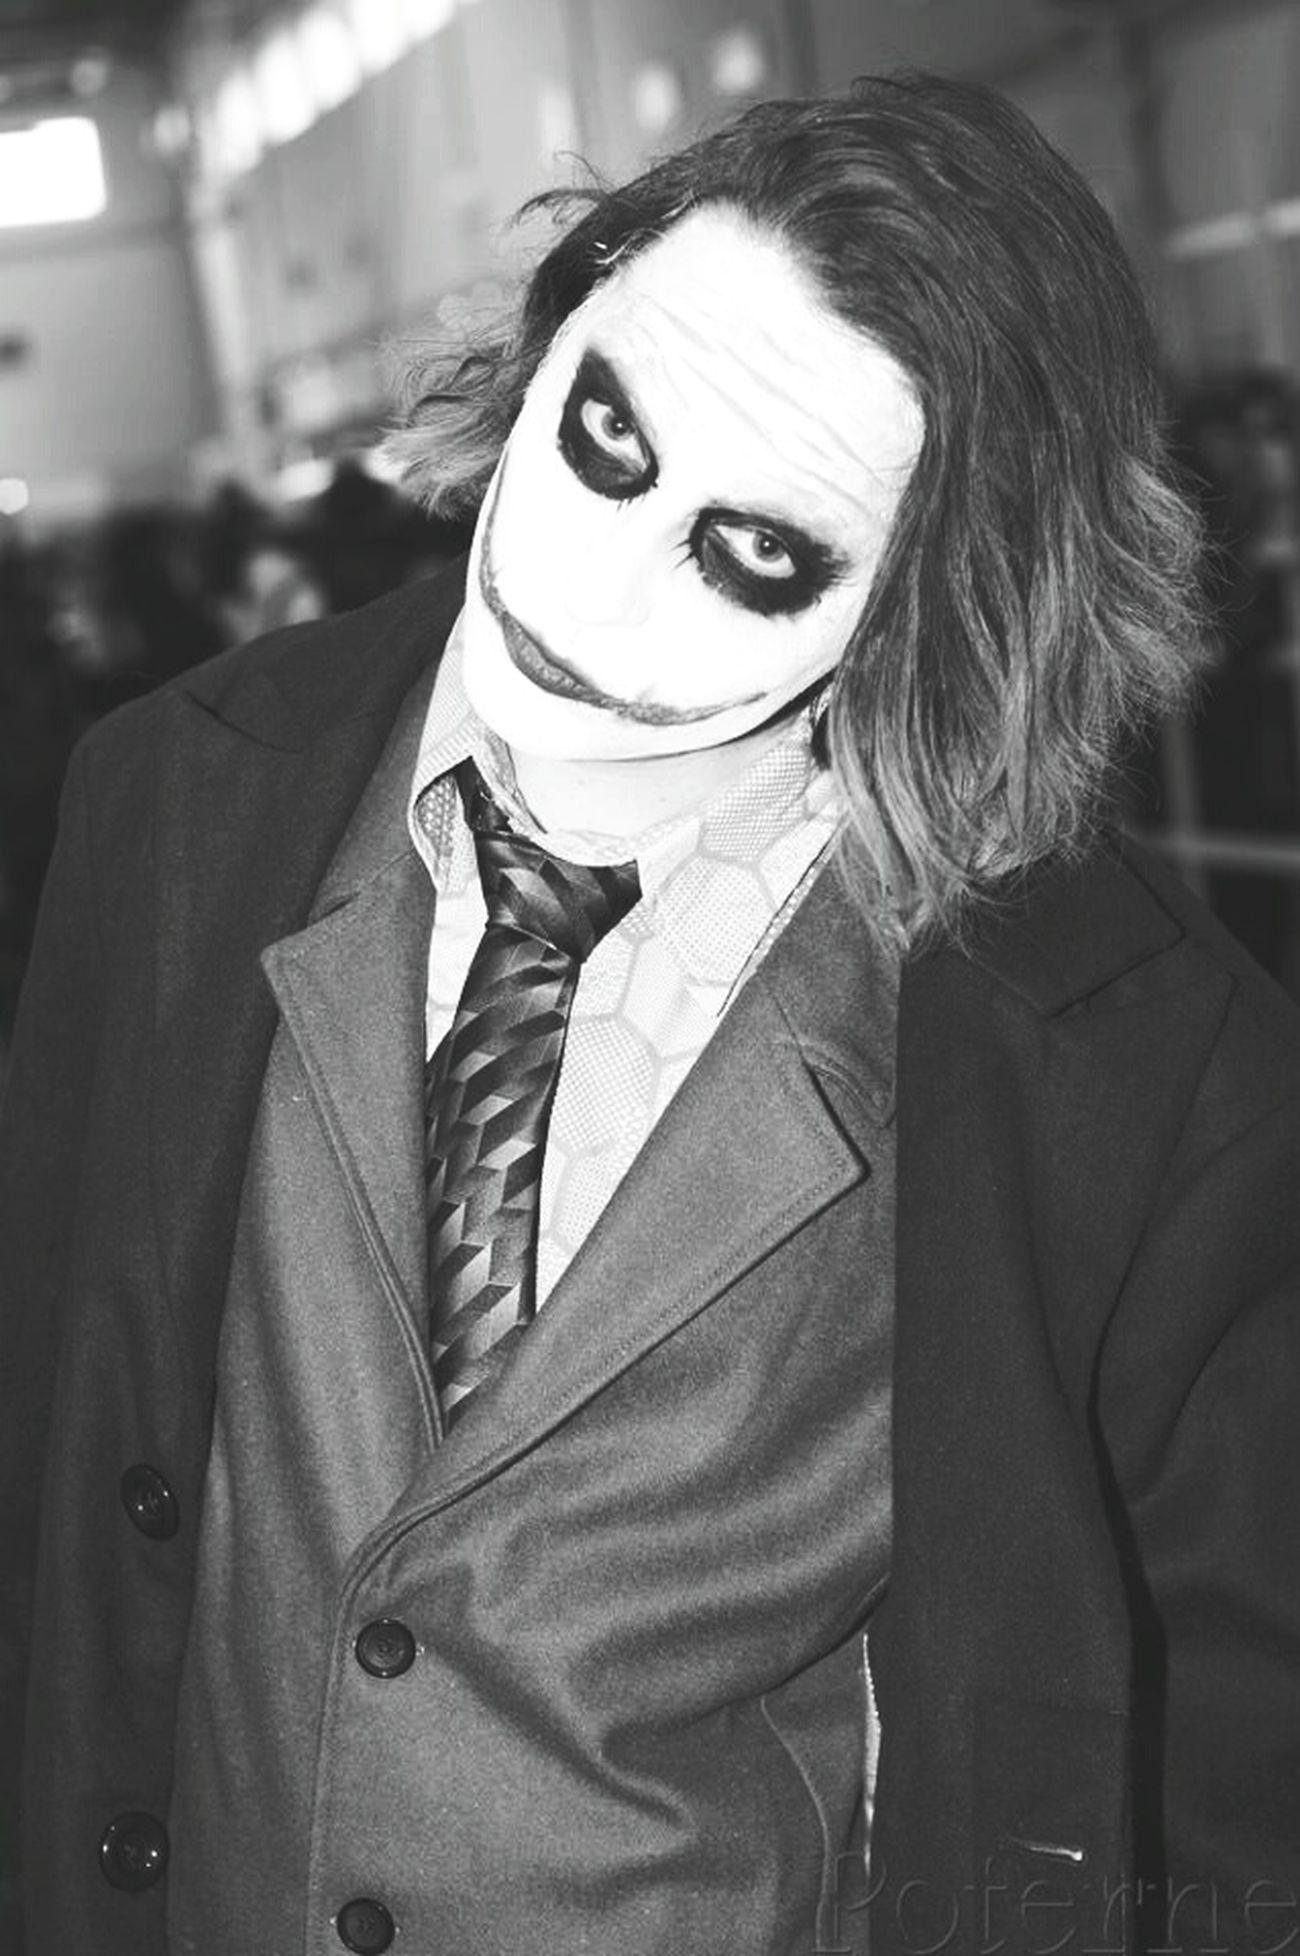 😻 Joker Batman